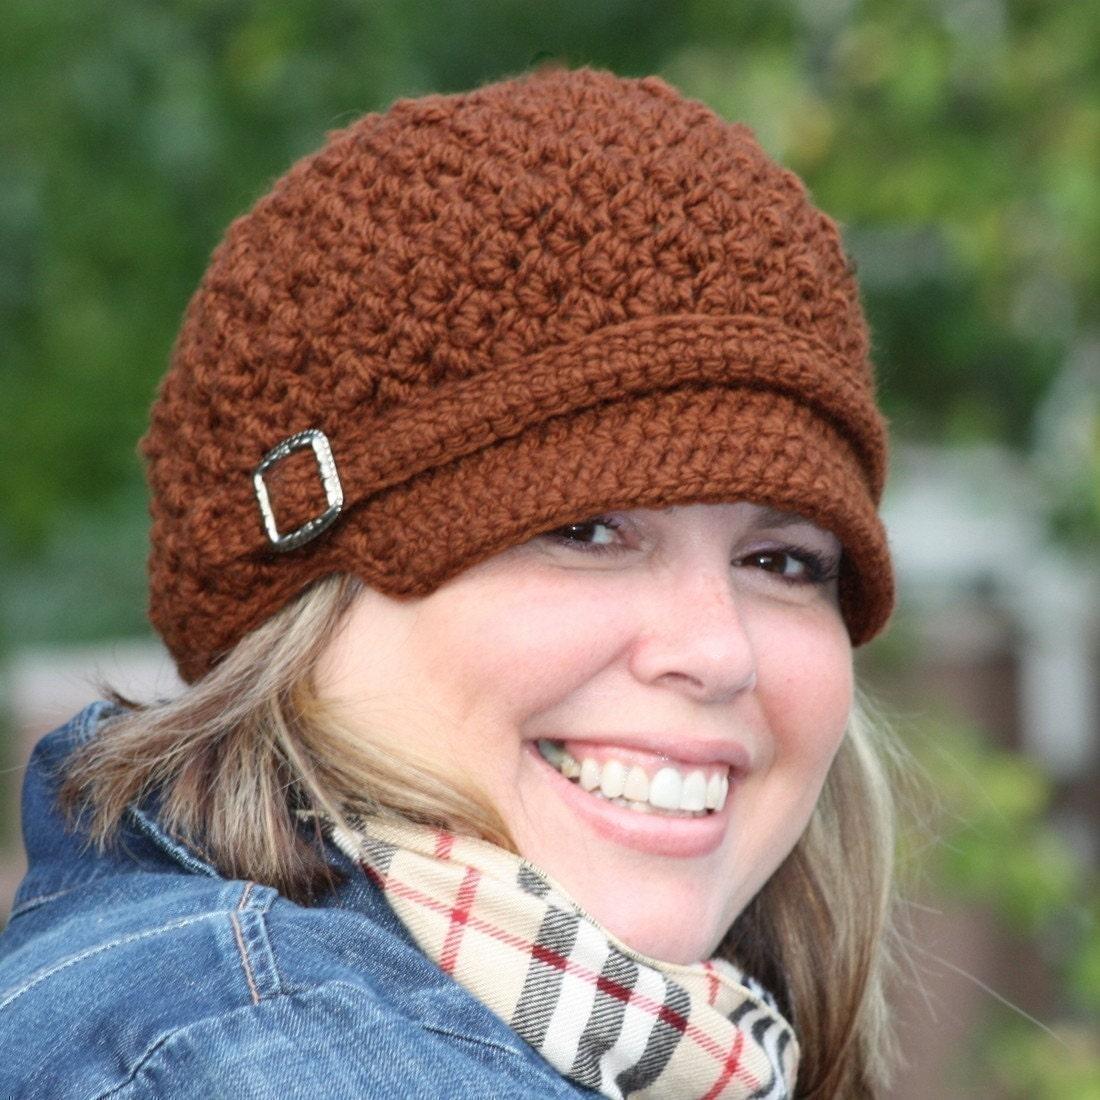 Free Crochet Pattern For A Newsboy Hat : CROCHET PATTERN Nubby Newsboy Cap 6 Sizes by ...